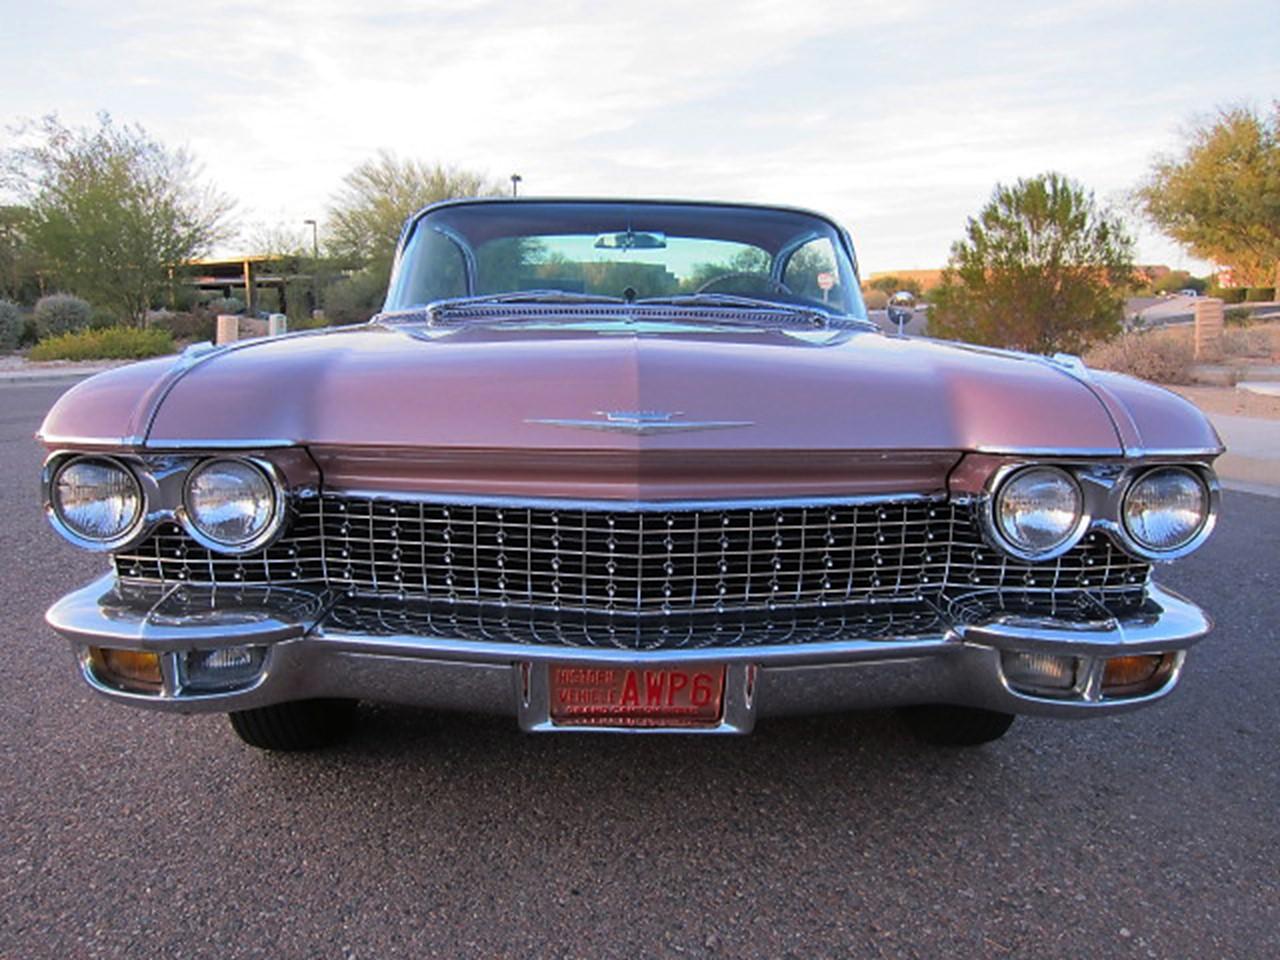 1960 Cadillac Series 6400 Eldorado Seville Notoriousluxury